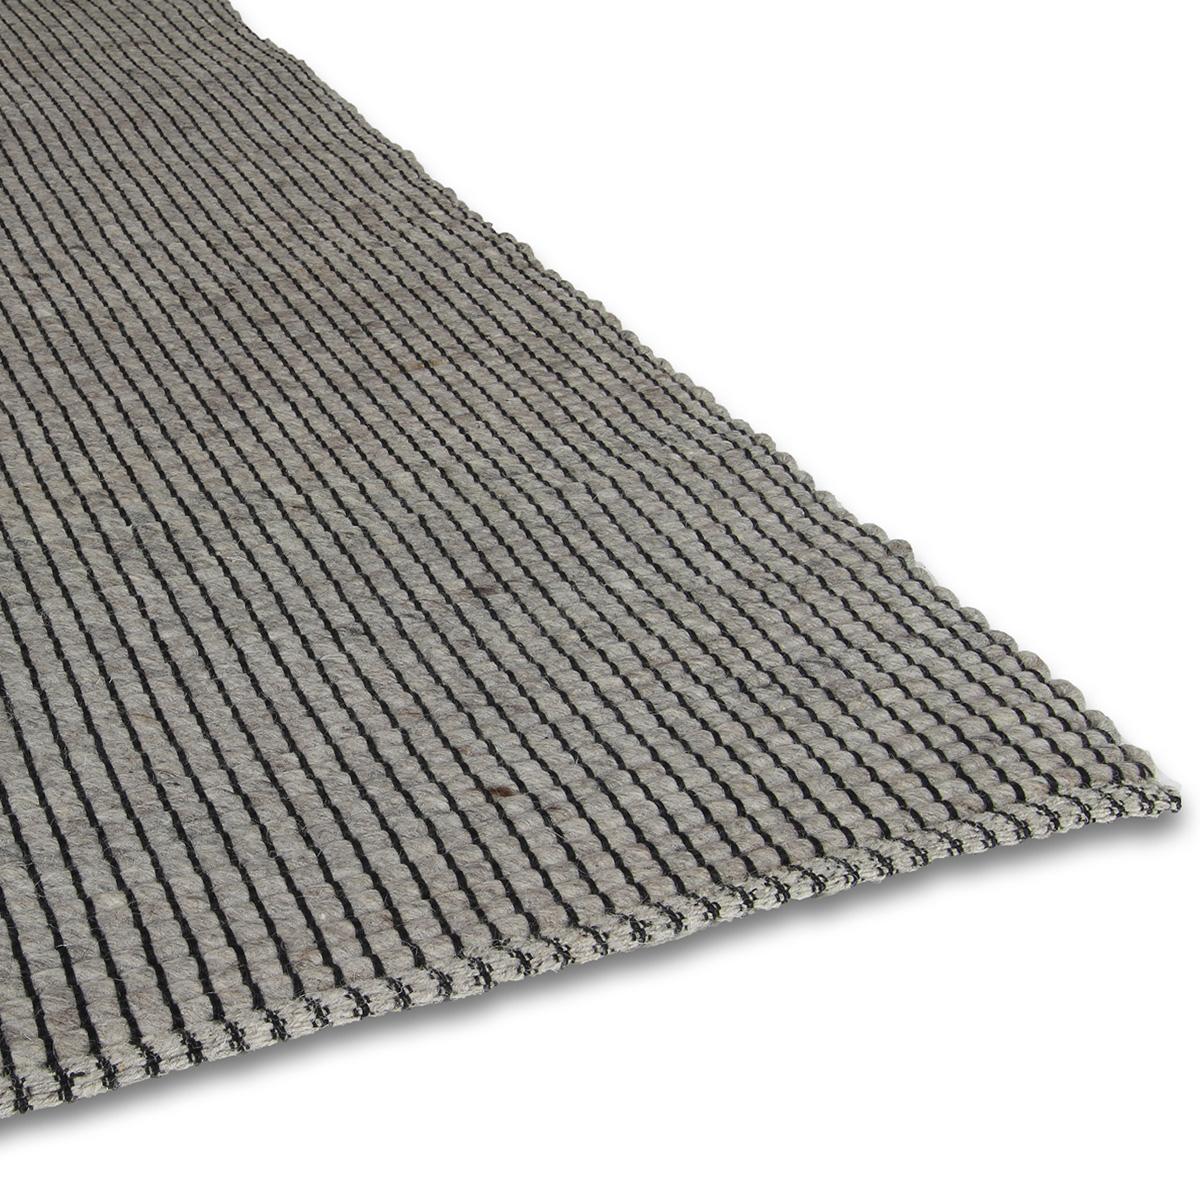 Vloerkleed Brinker Beatbridge Grey | 160 x 230 cm